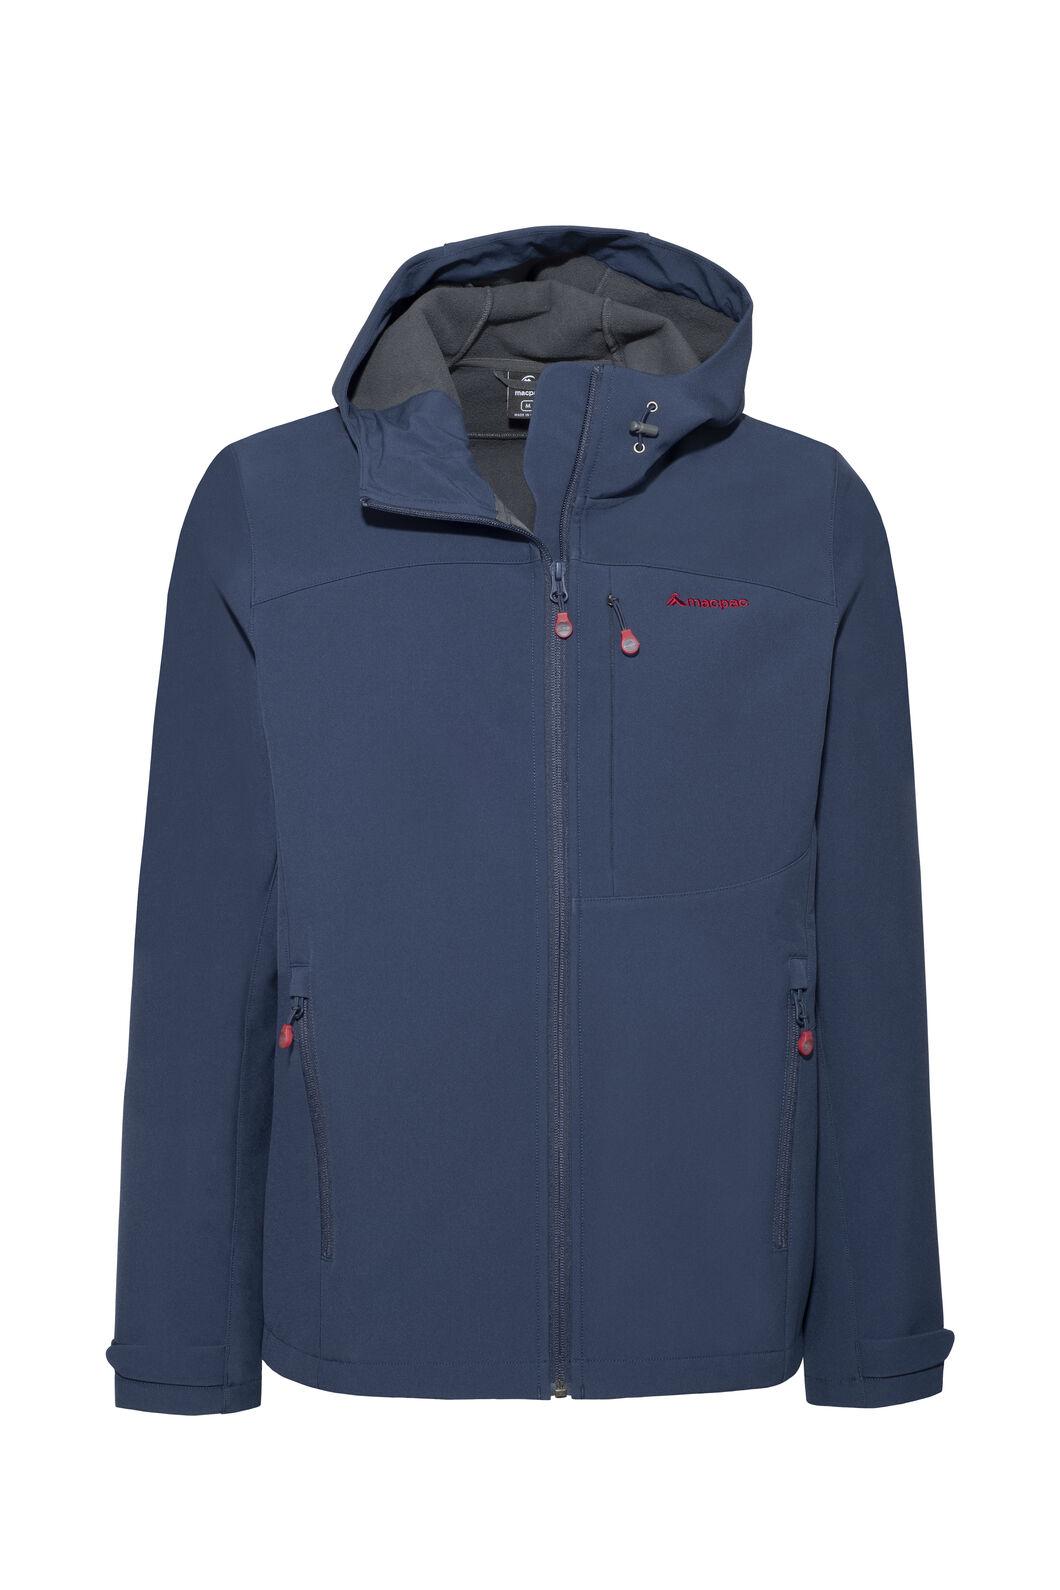 Macpac Sabre Hooded Softshell Jacket — Men's, Black Iris/Rio Red, hi-res